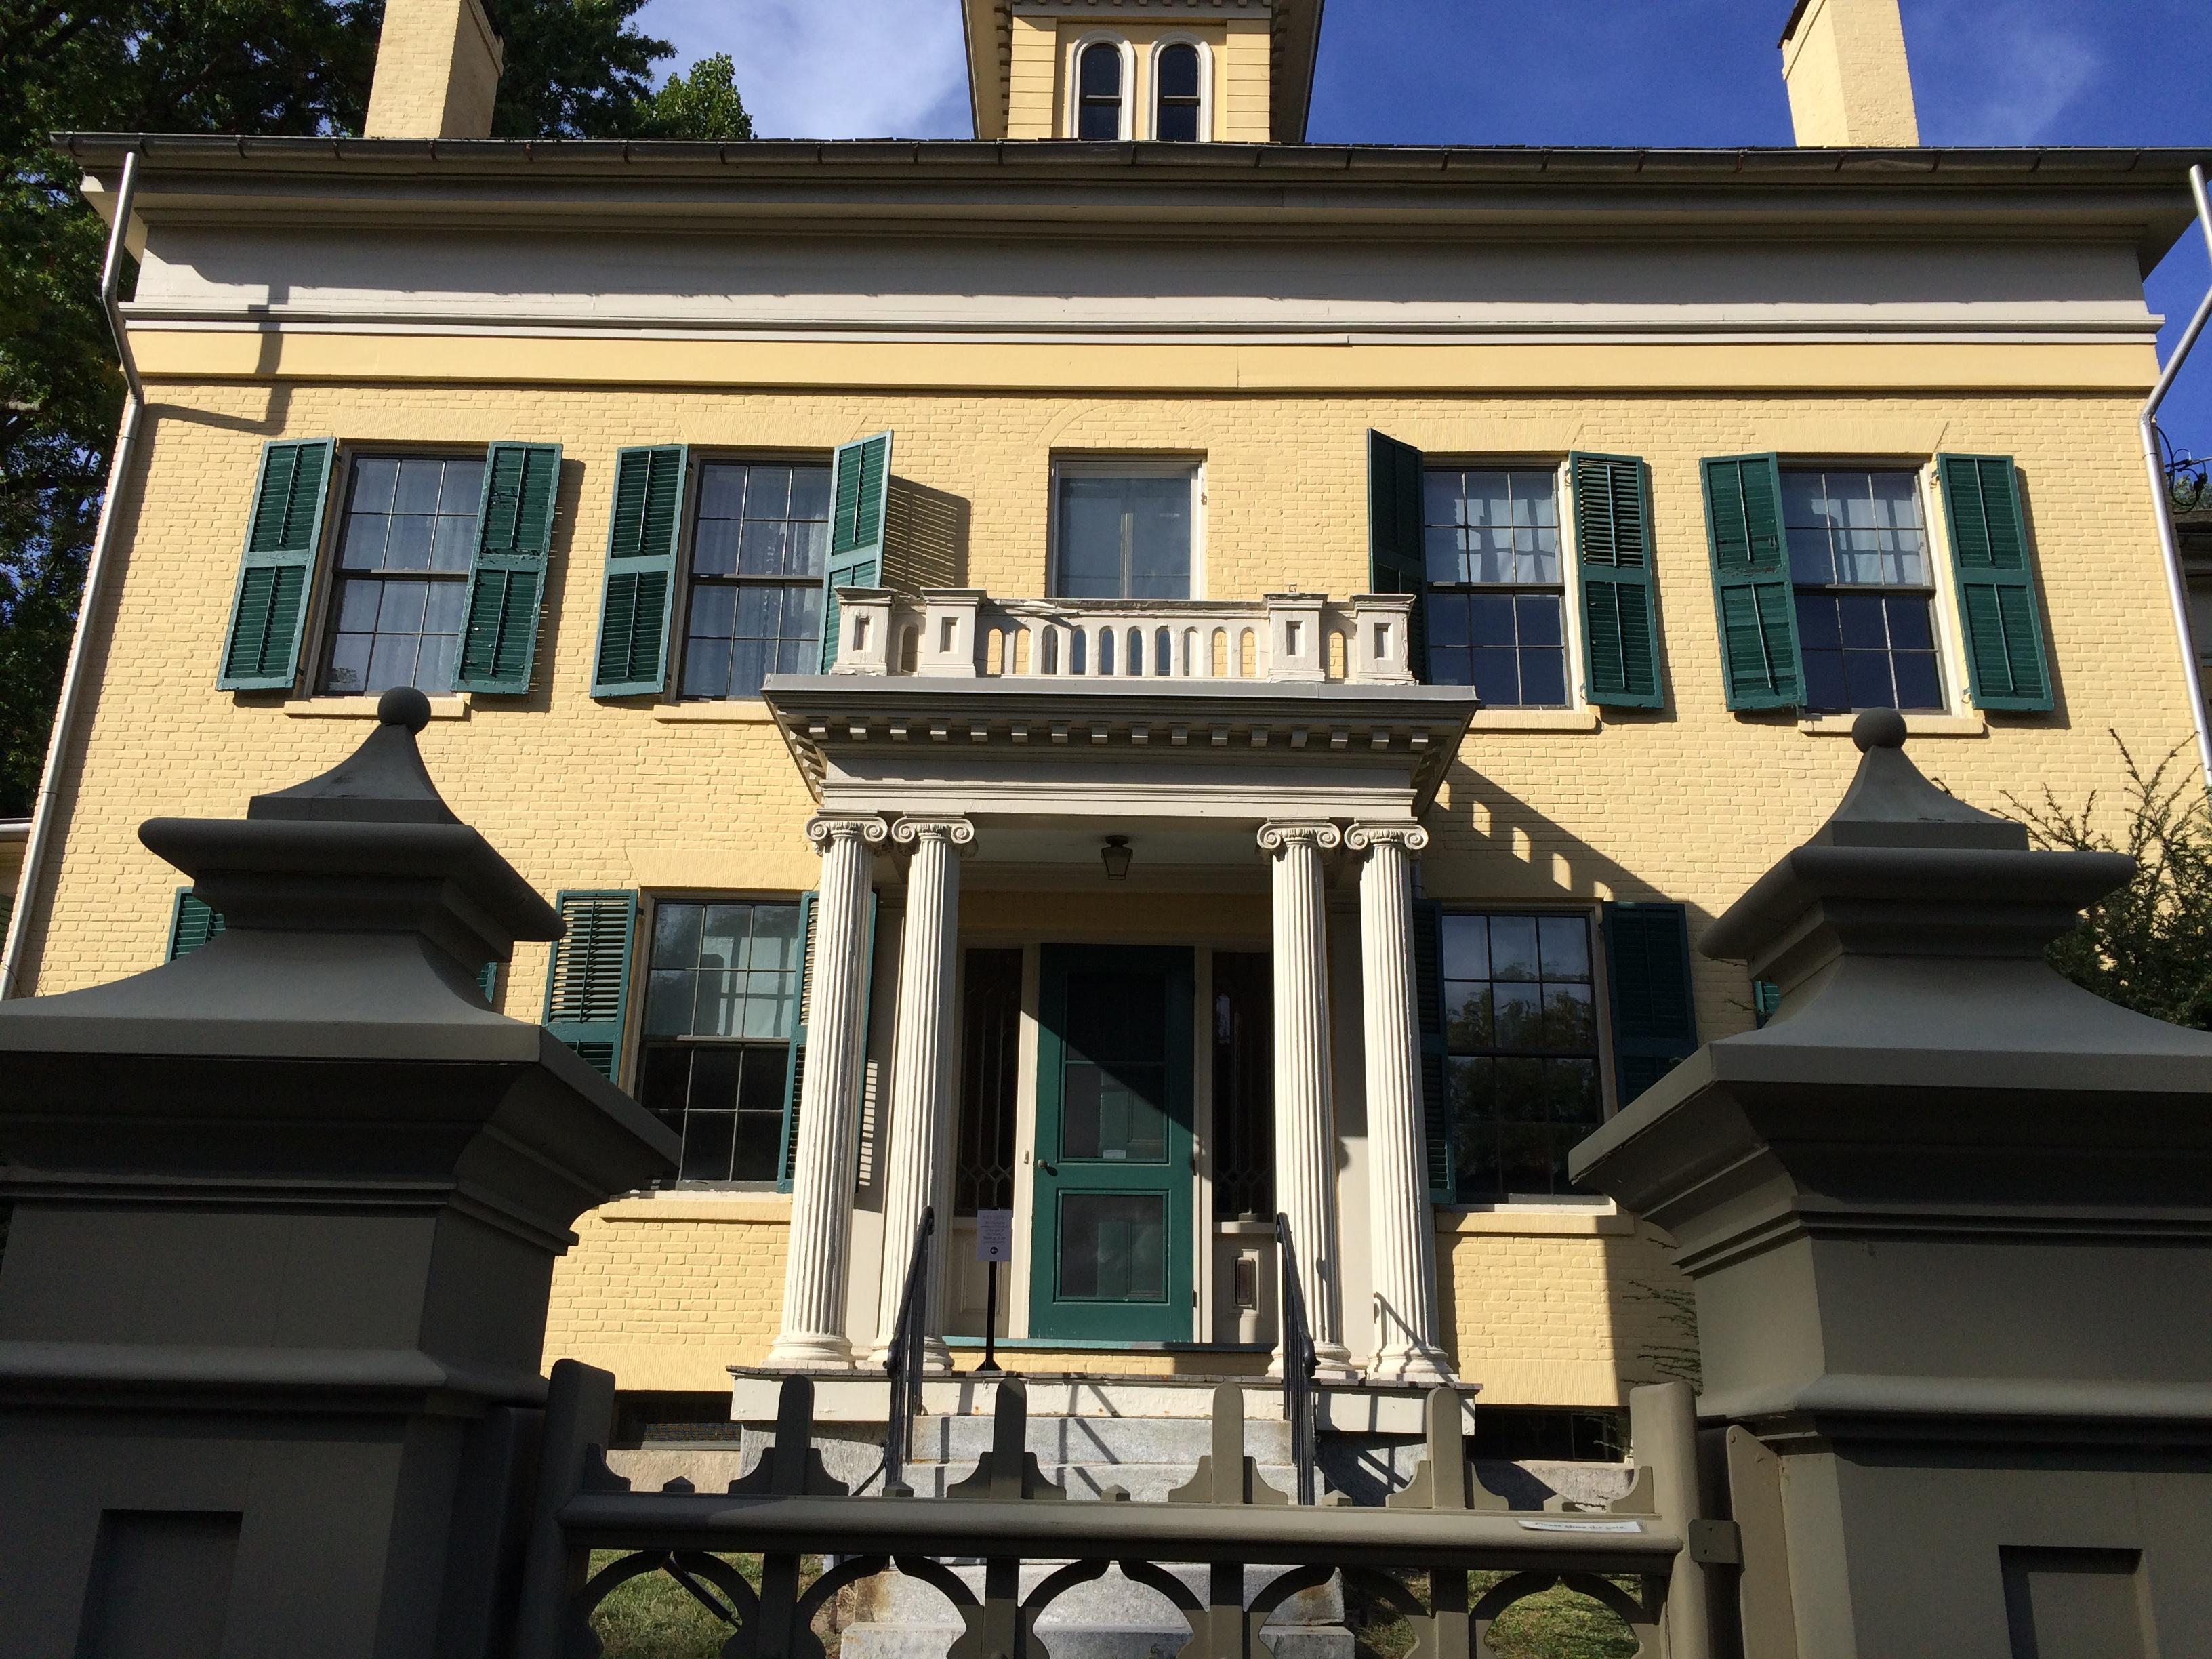 Emily Dickinson's House